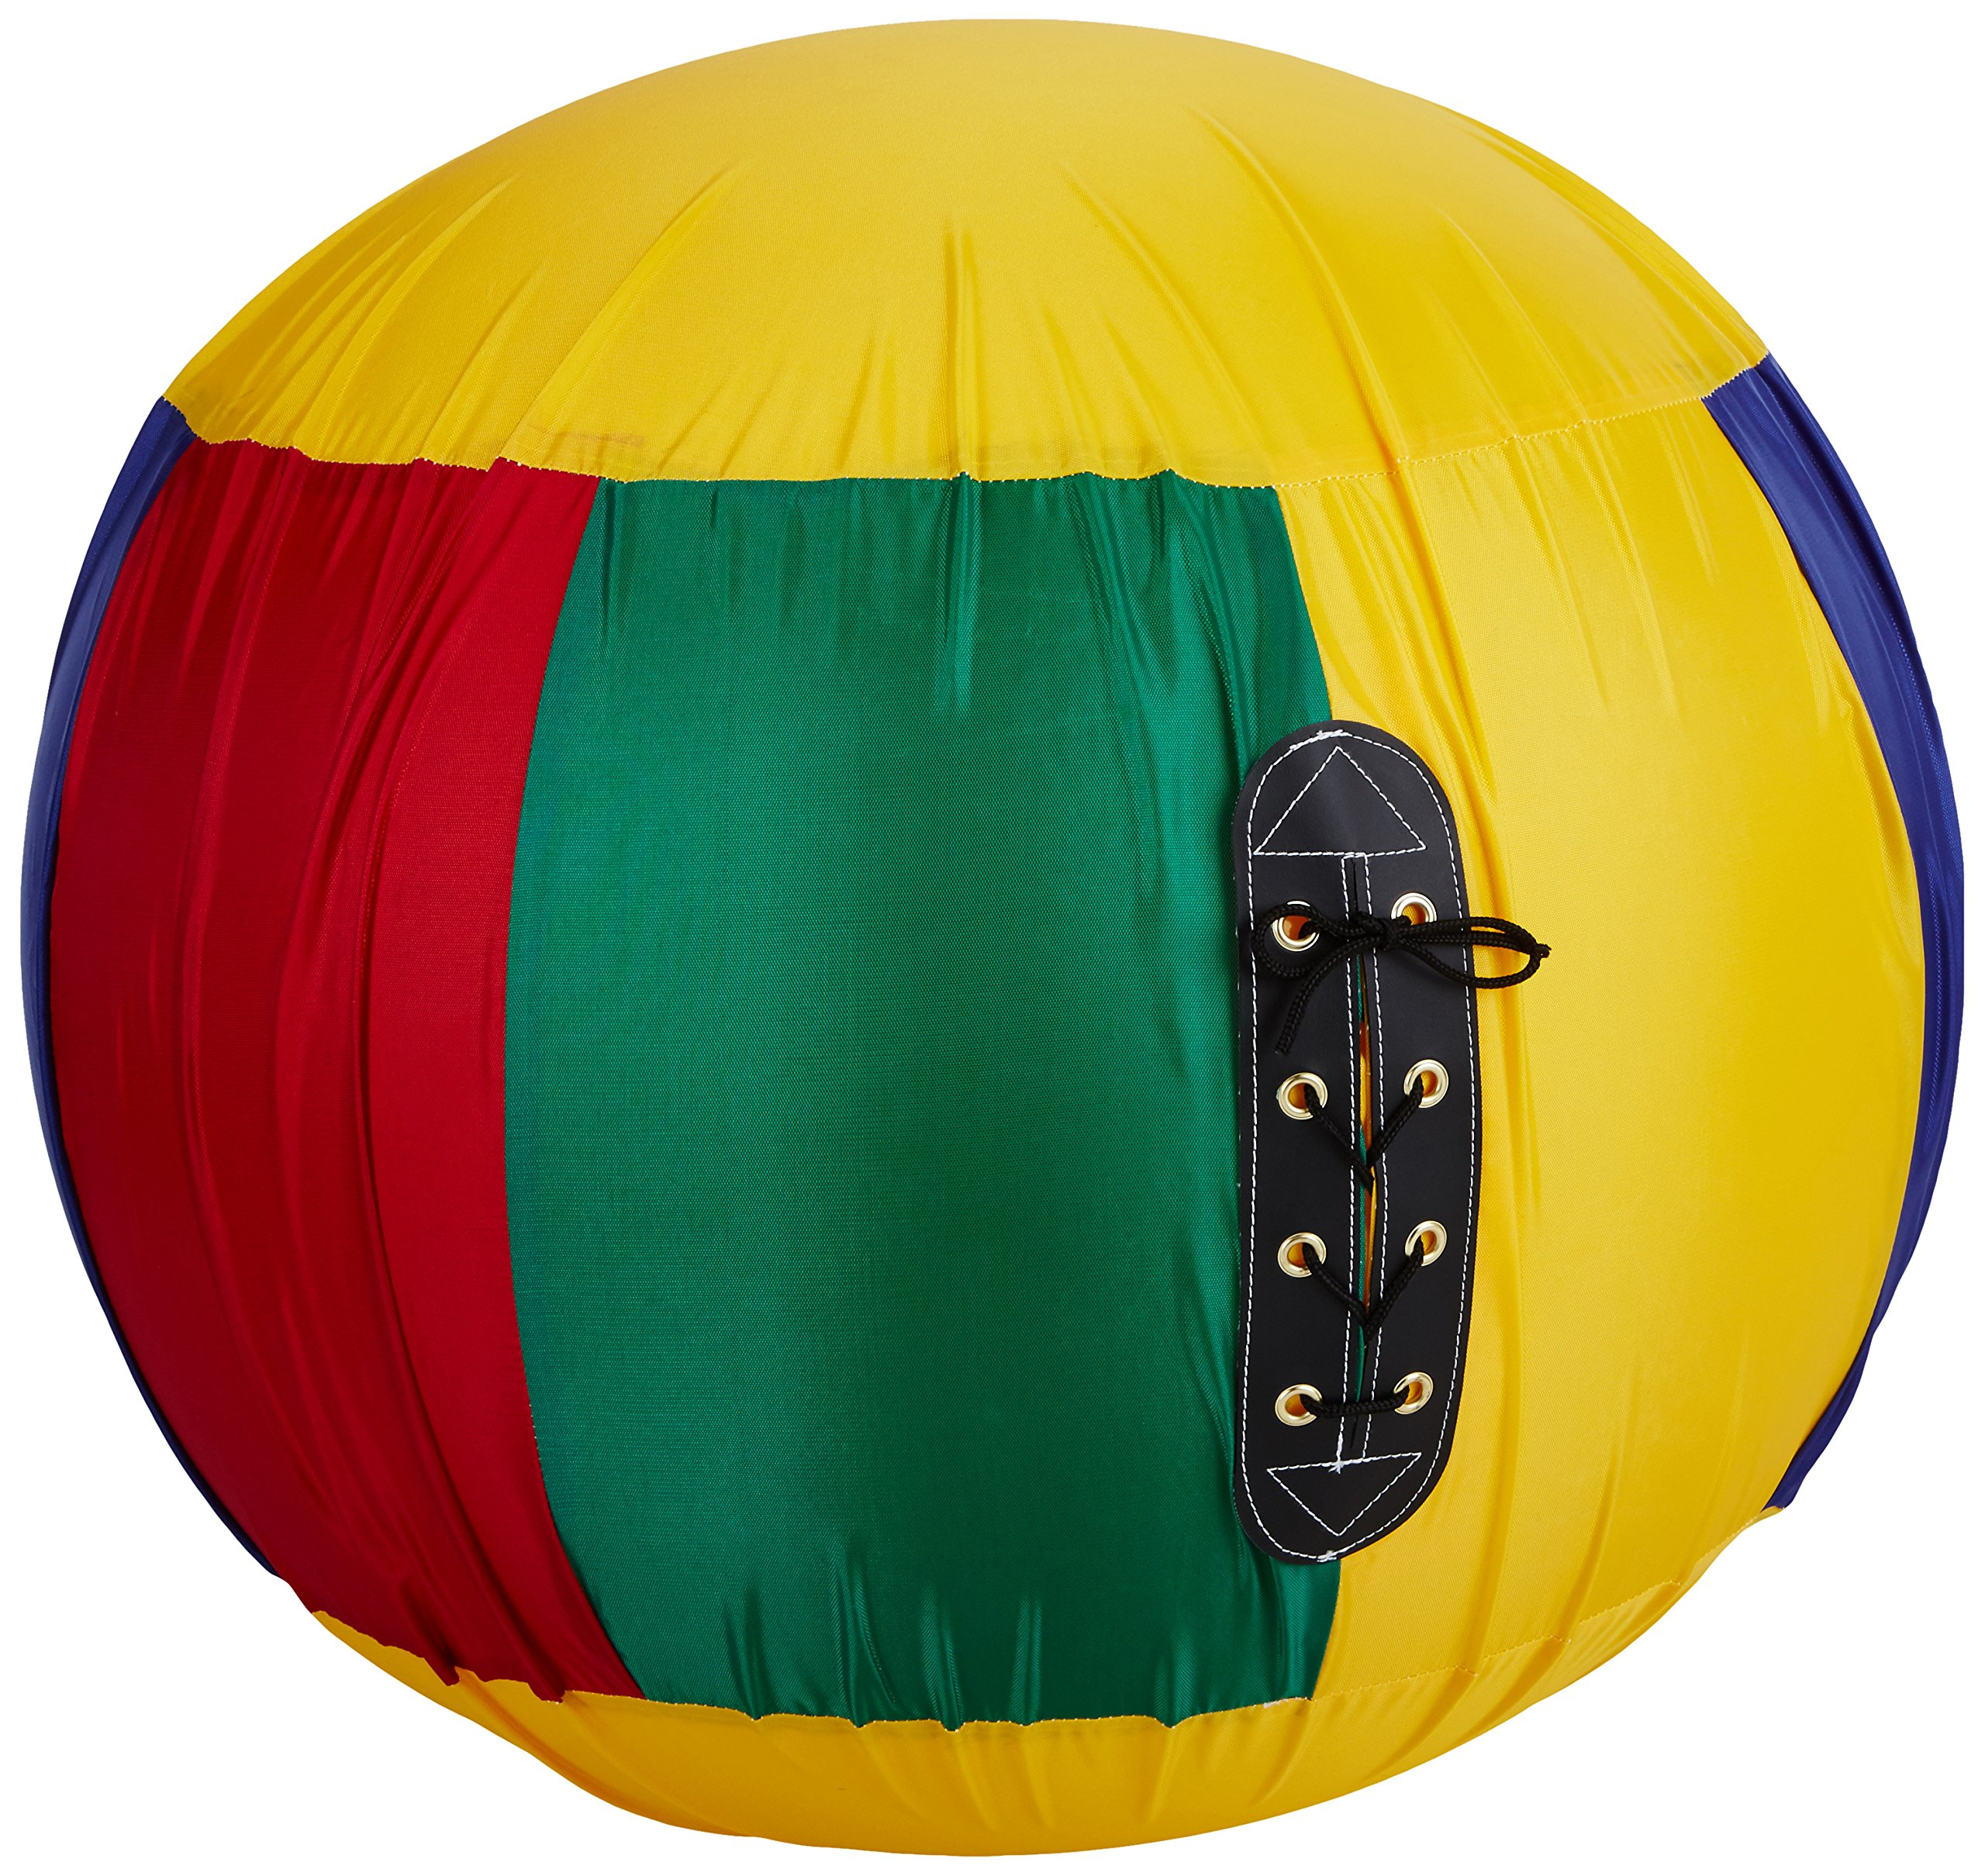 American Educational Products Balance Ball